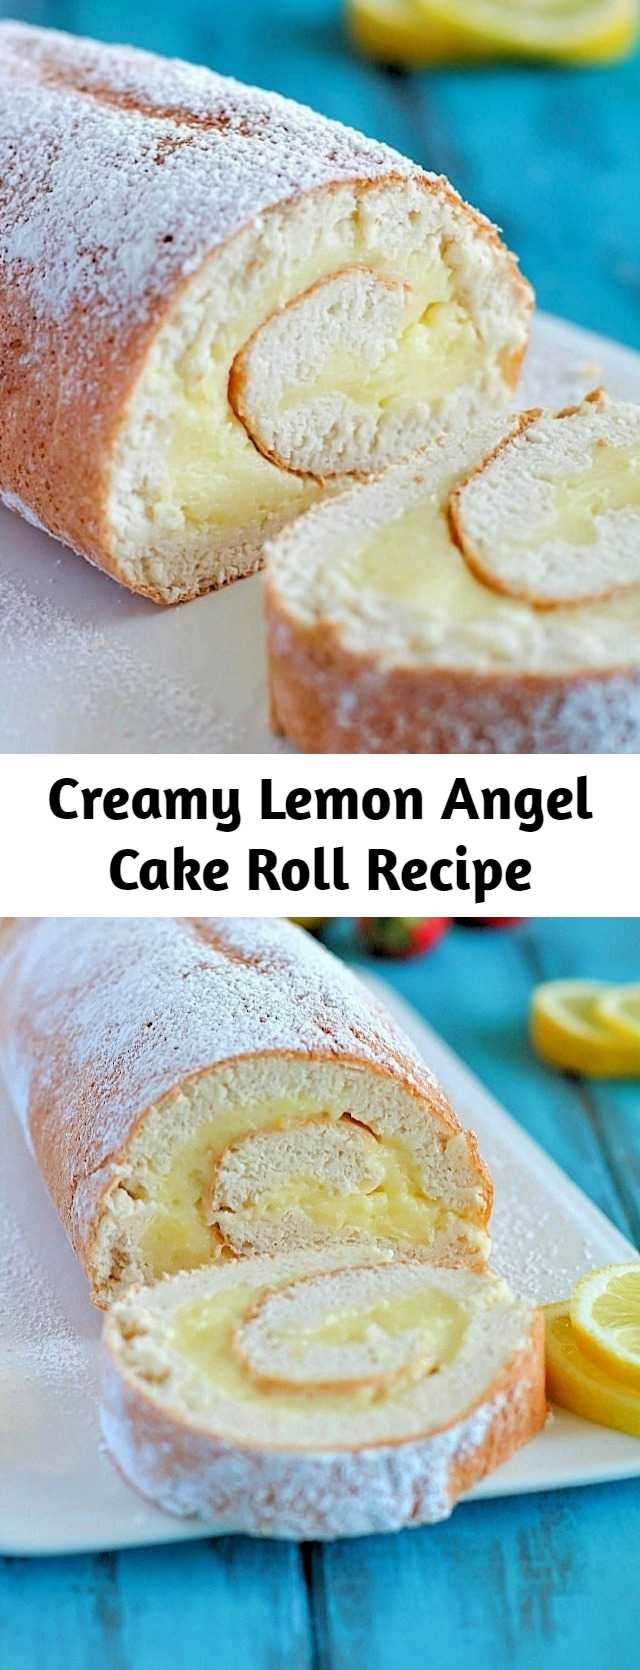 Creamy Lemon Angel Cake Roll Recipe